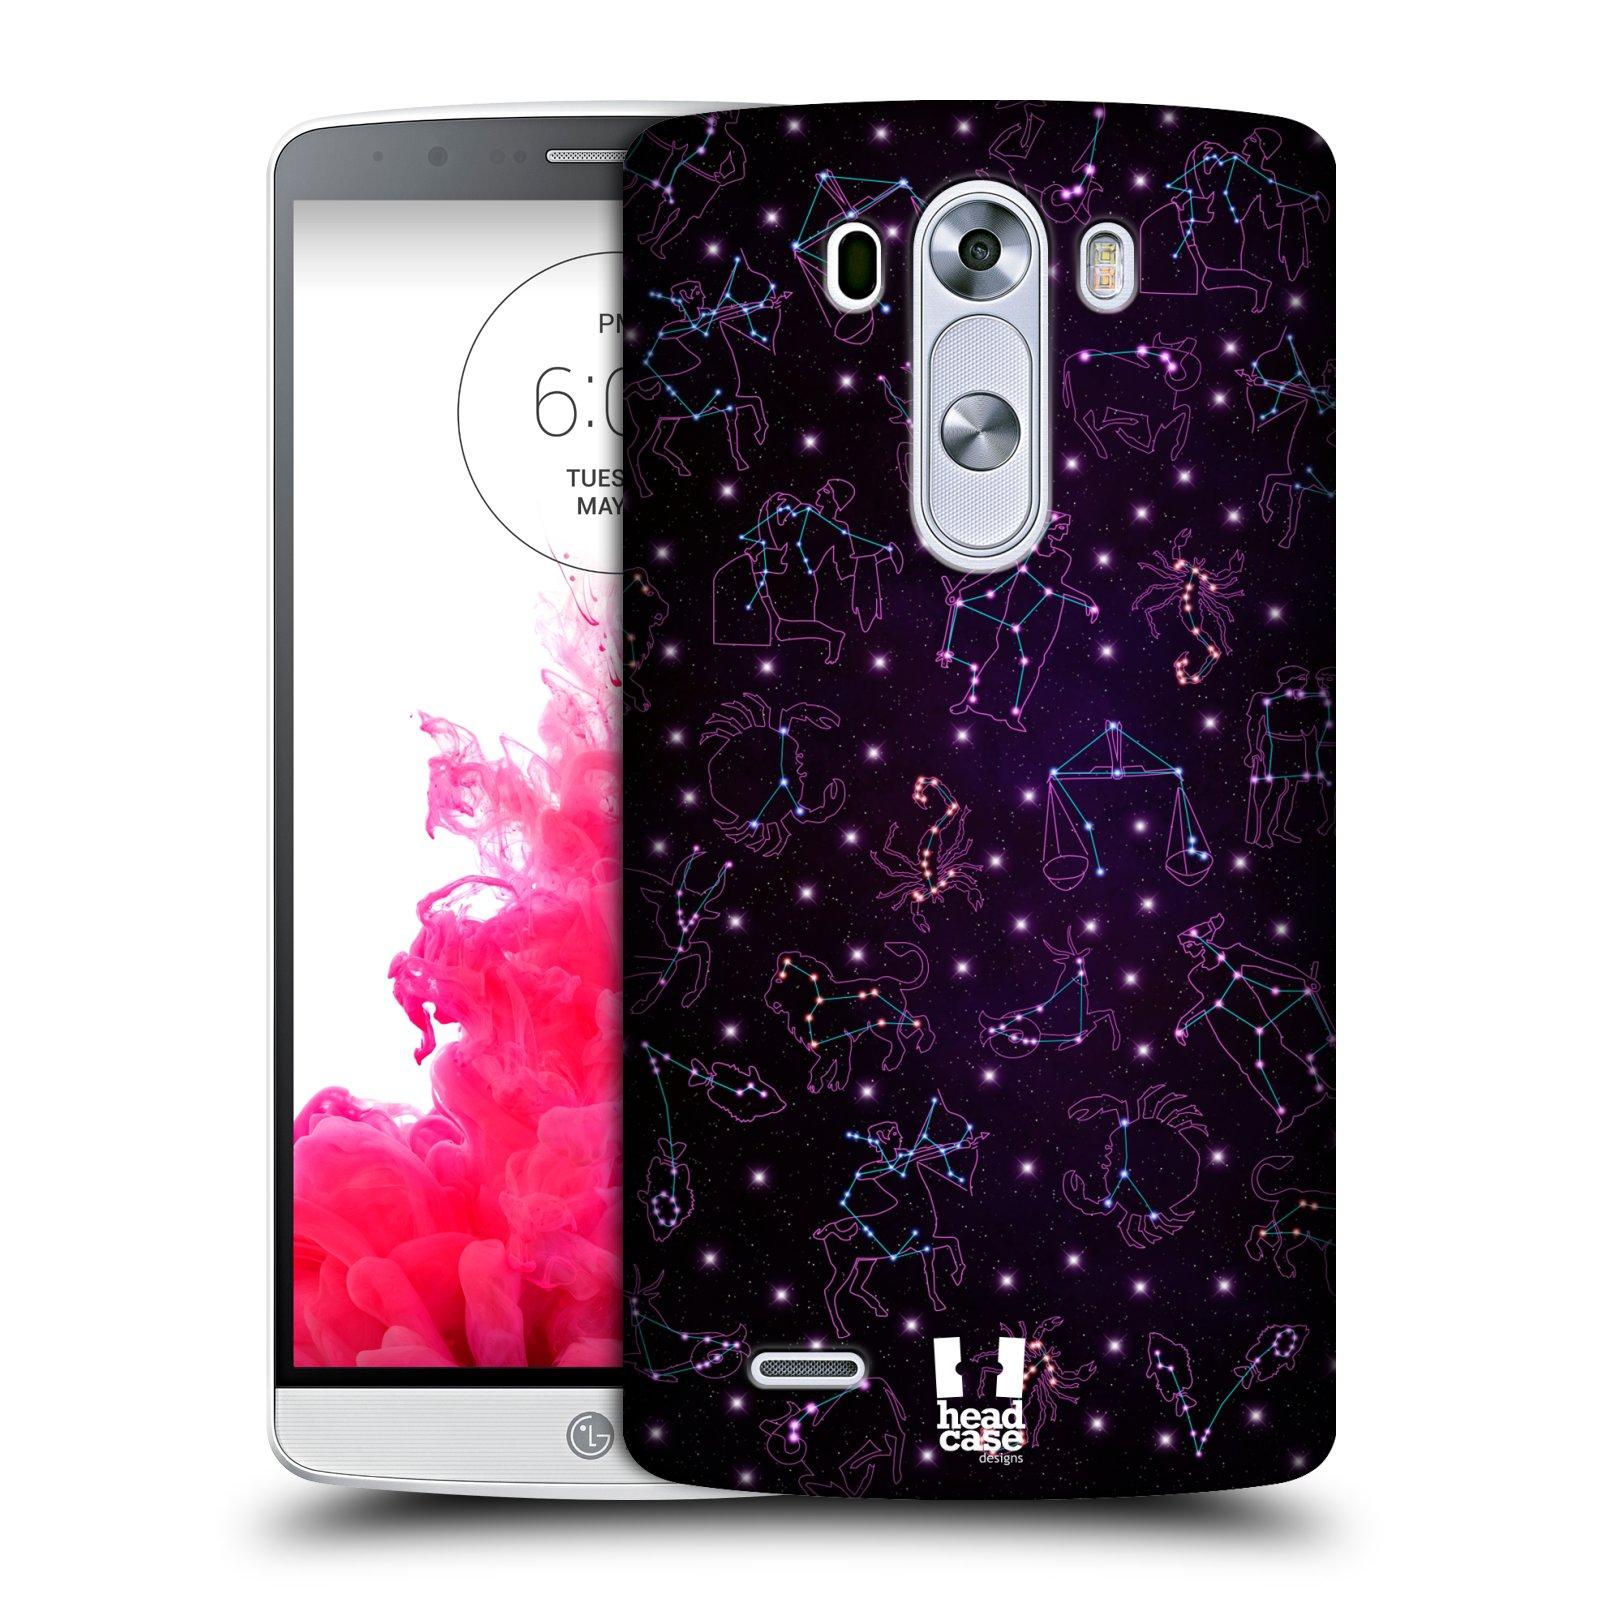 HEAD CASE DESIGNS CONSTELLATION PATTERNS HARD BACK CASE FOR LG PHONES 1